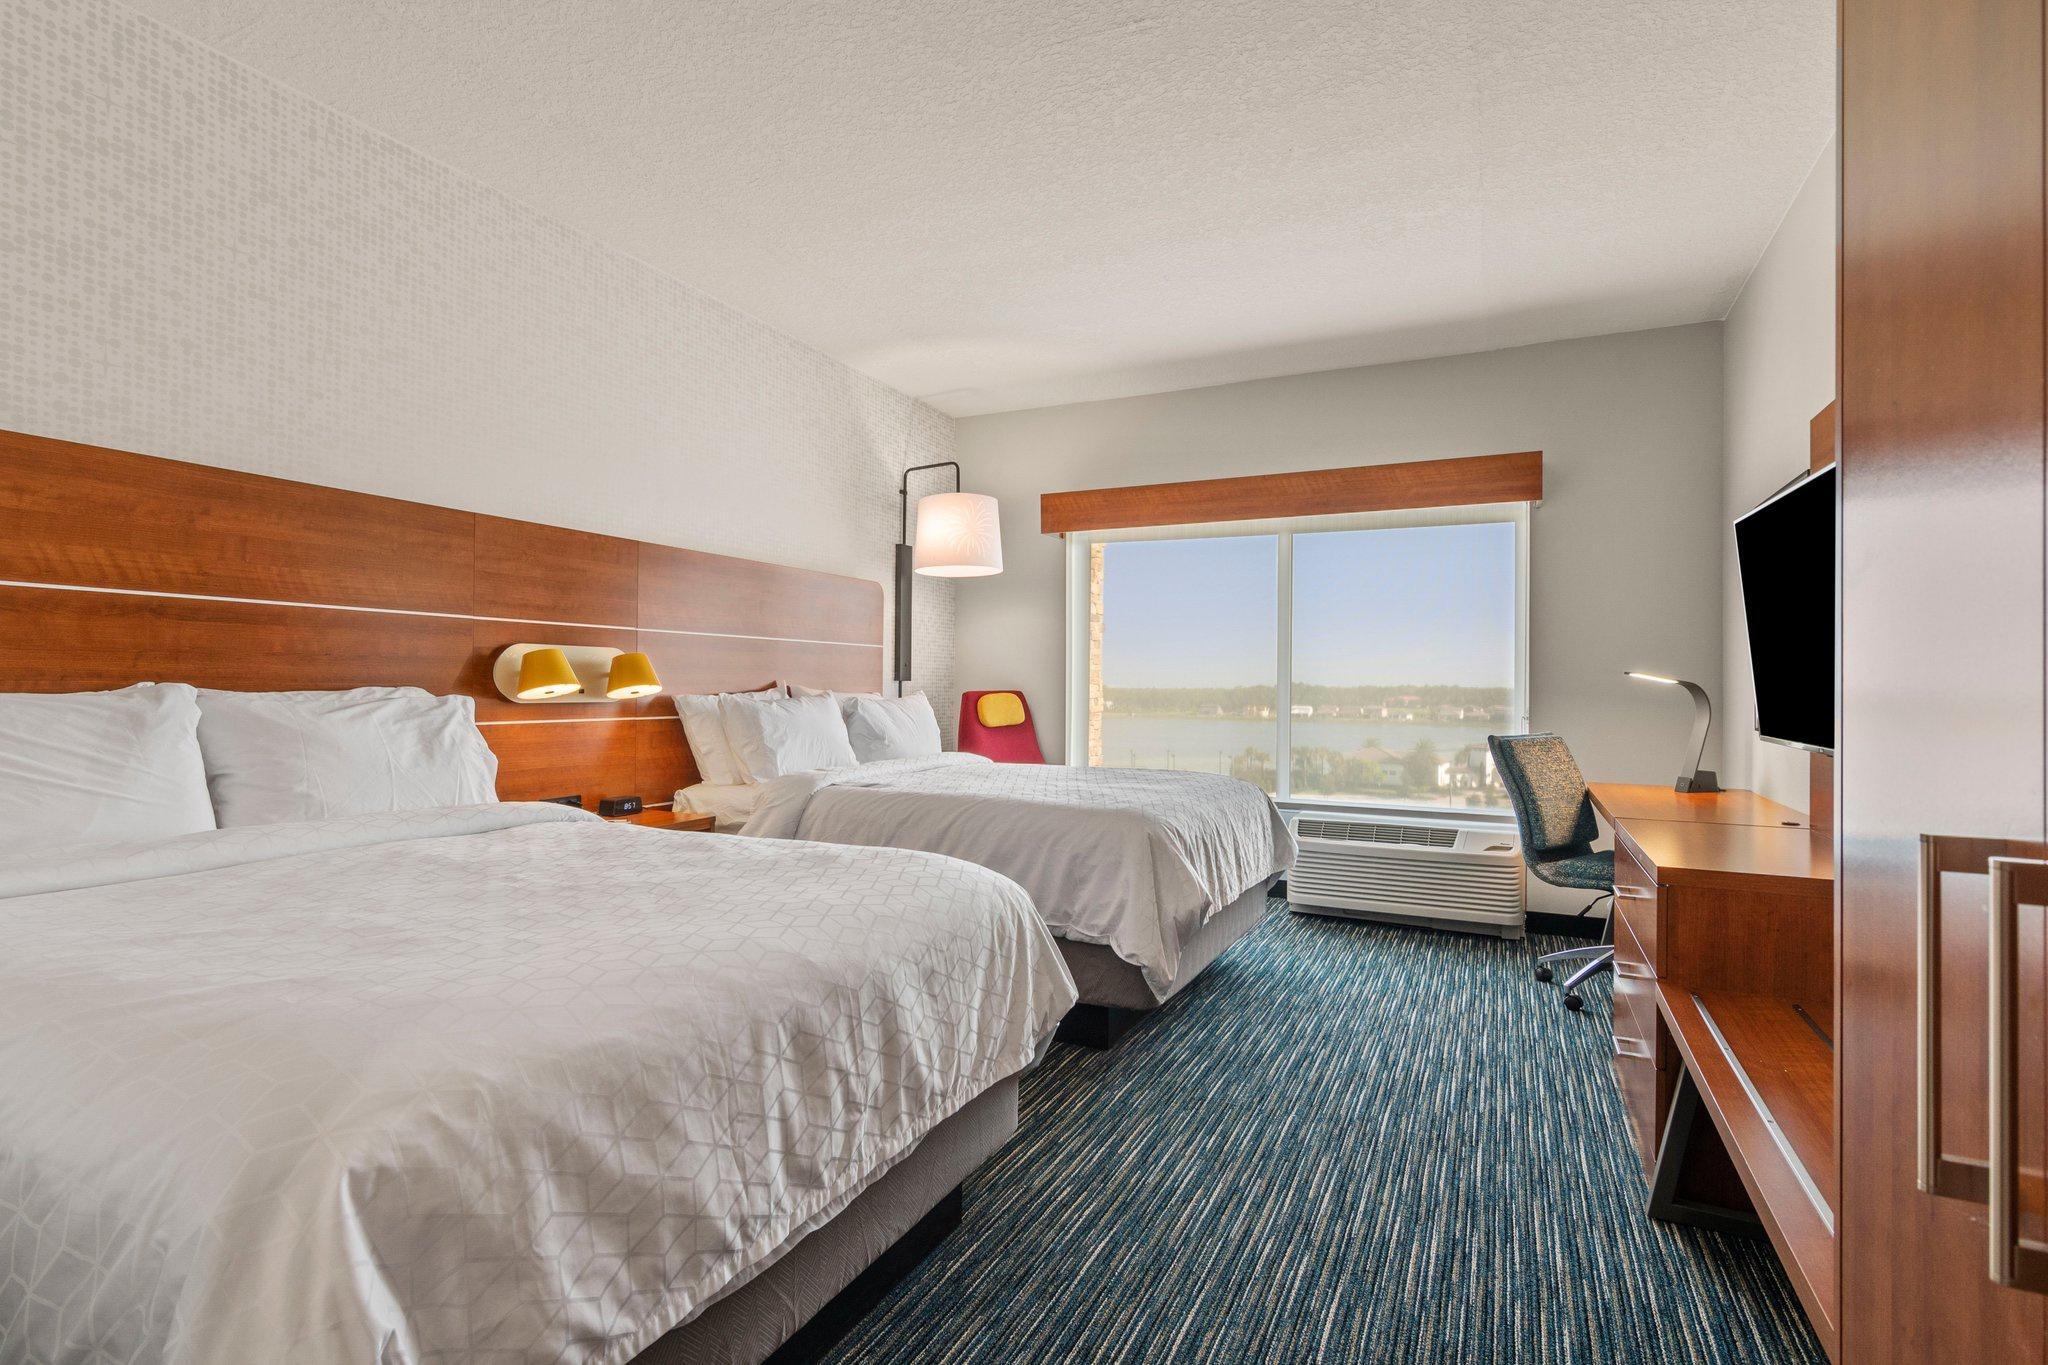 Holiday Inn Express & Suites Orlando - Lake Buena Vista